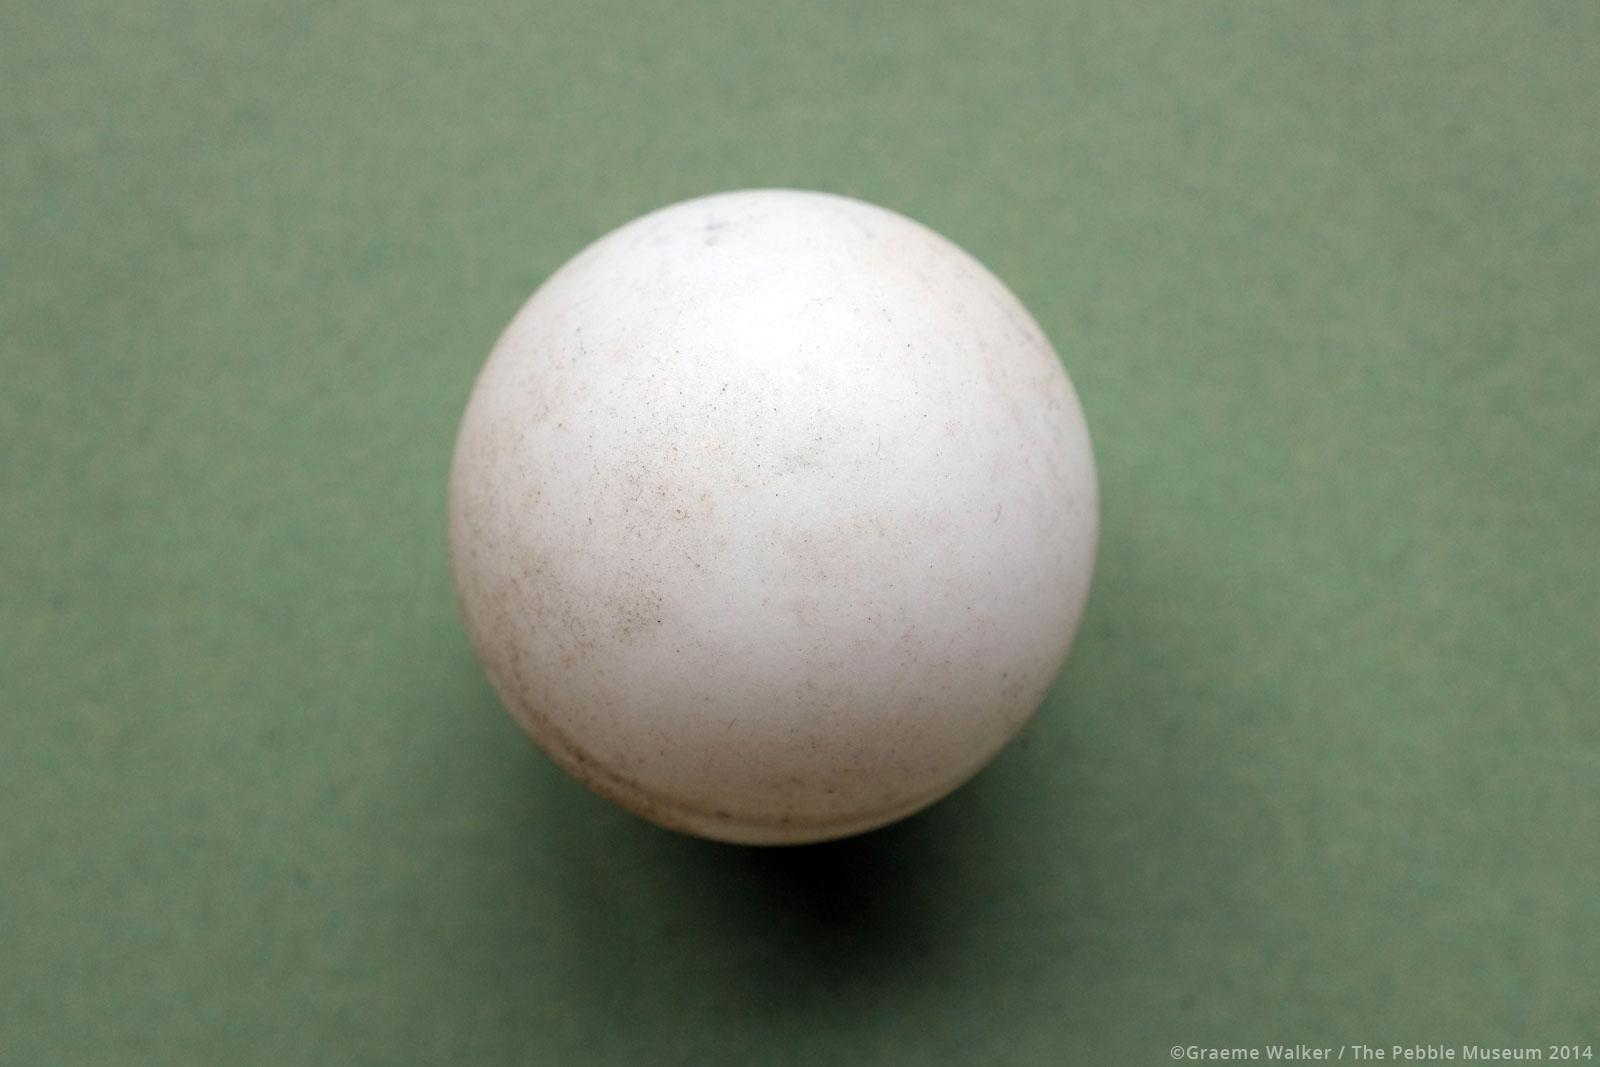 Table Tennis Ball © Graeme Walker / The Pebble Museum 2019